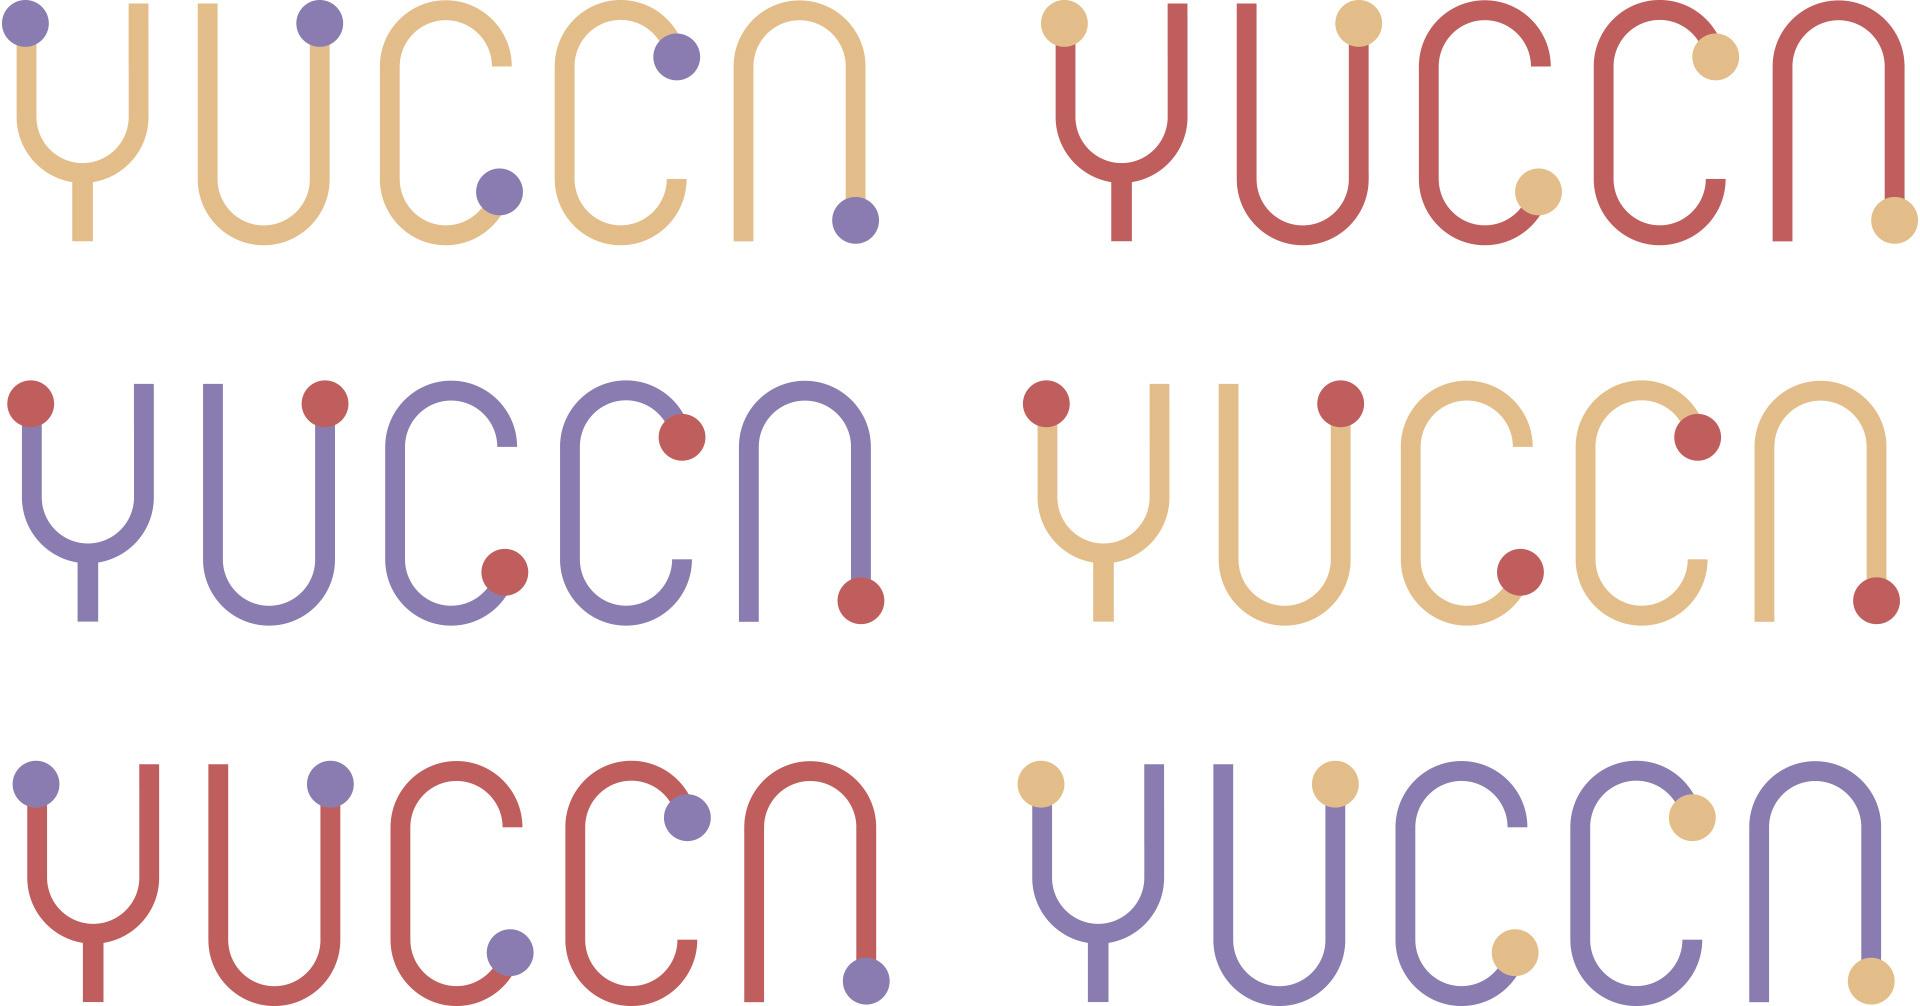 Alice_Stivala_Visual_Designer_Yucca_logotipo_2